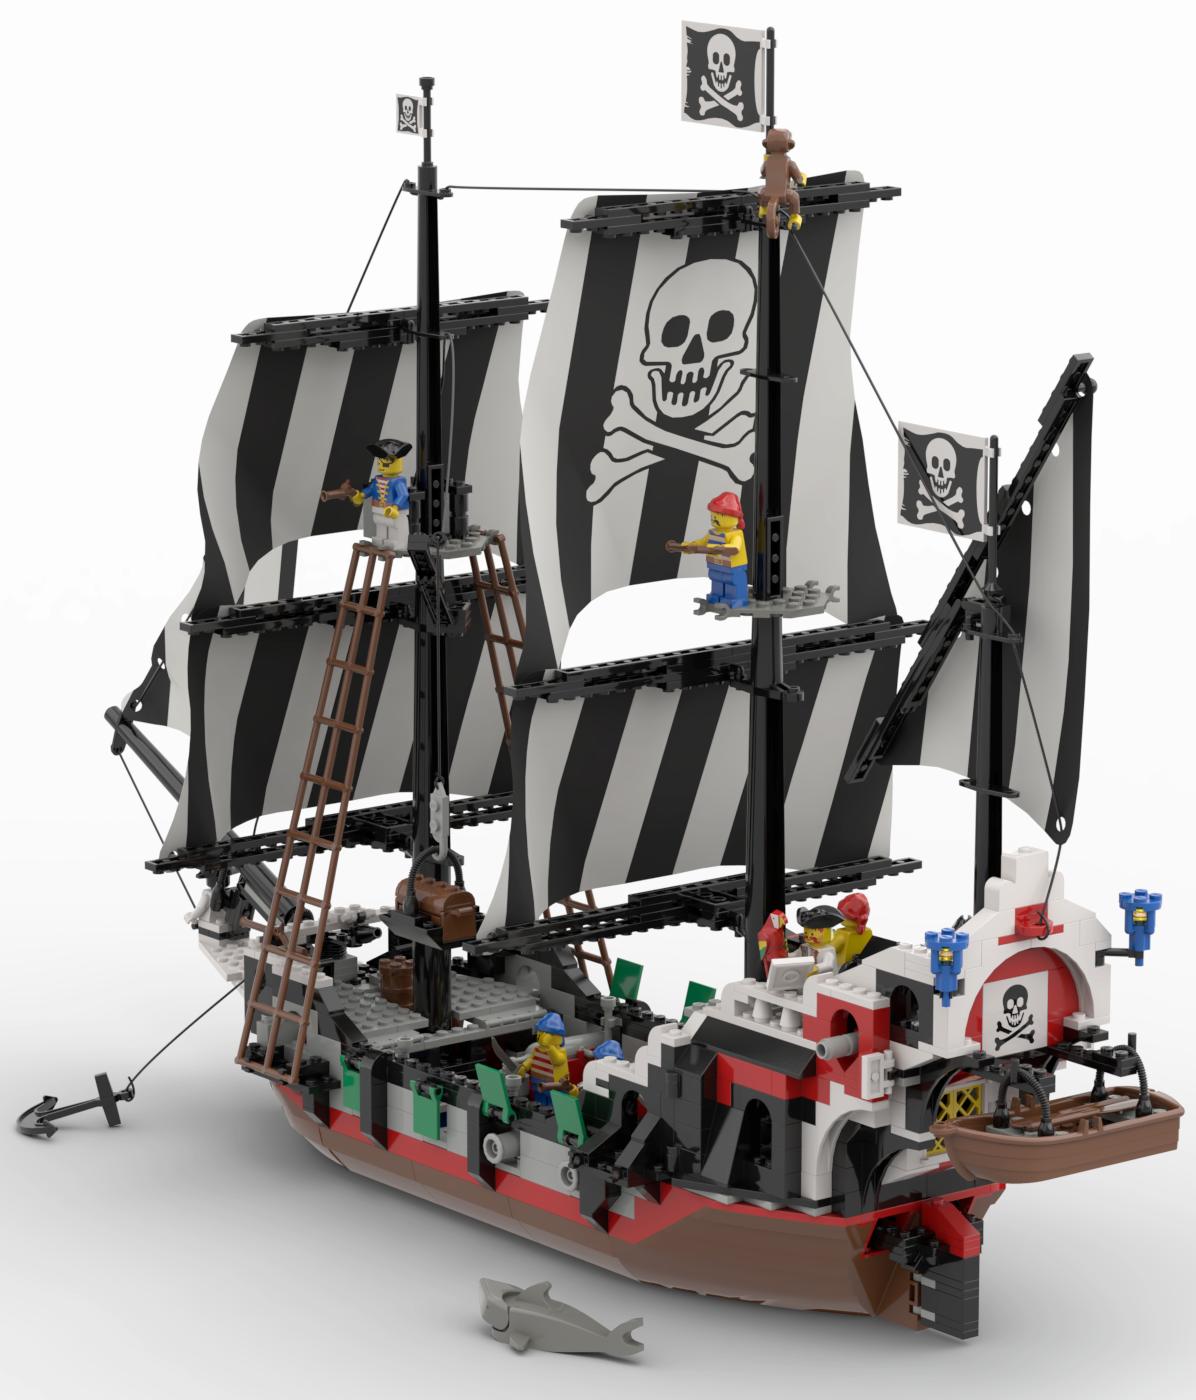 [Image: 6286_-_skull_s_eye_schooner_2.png]